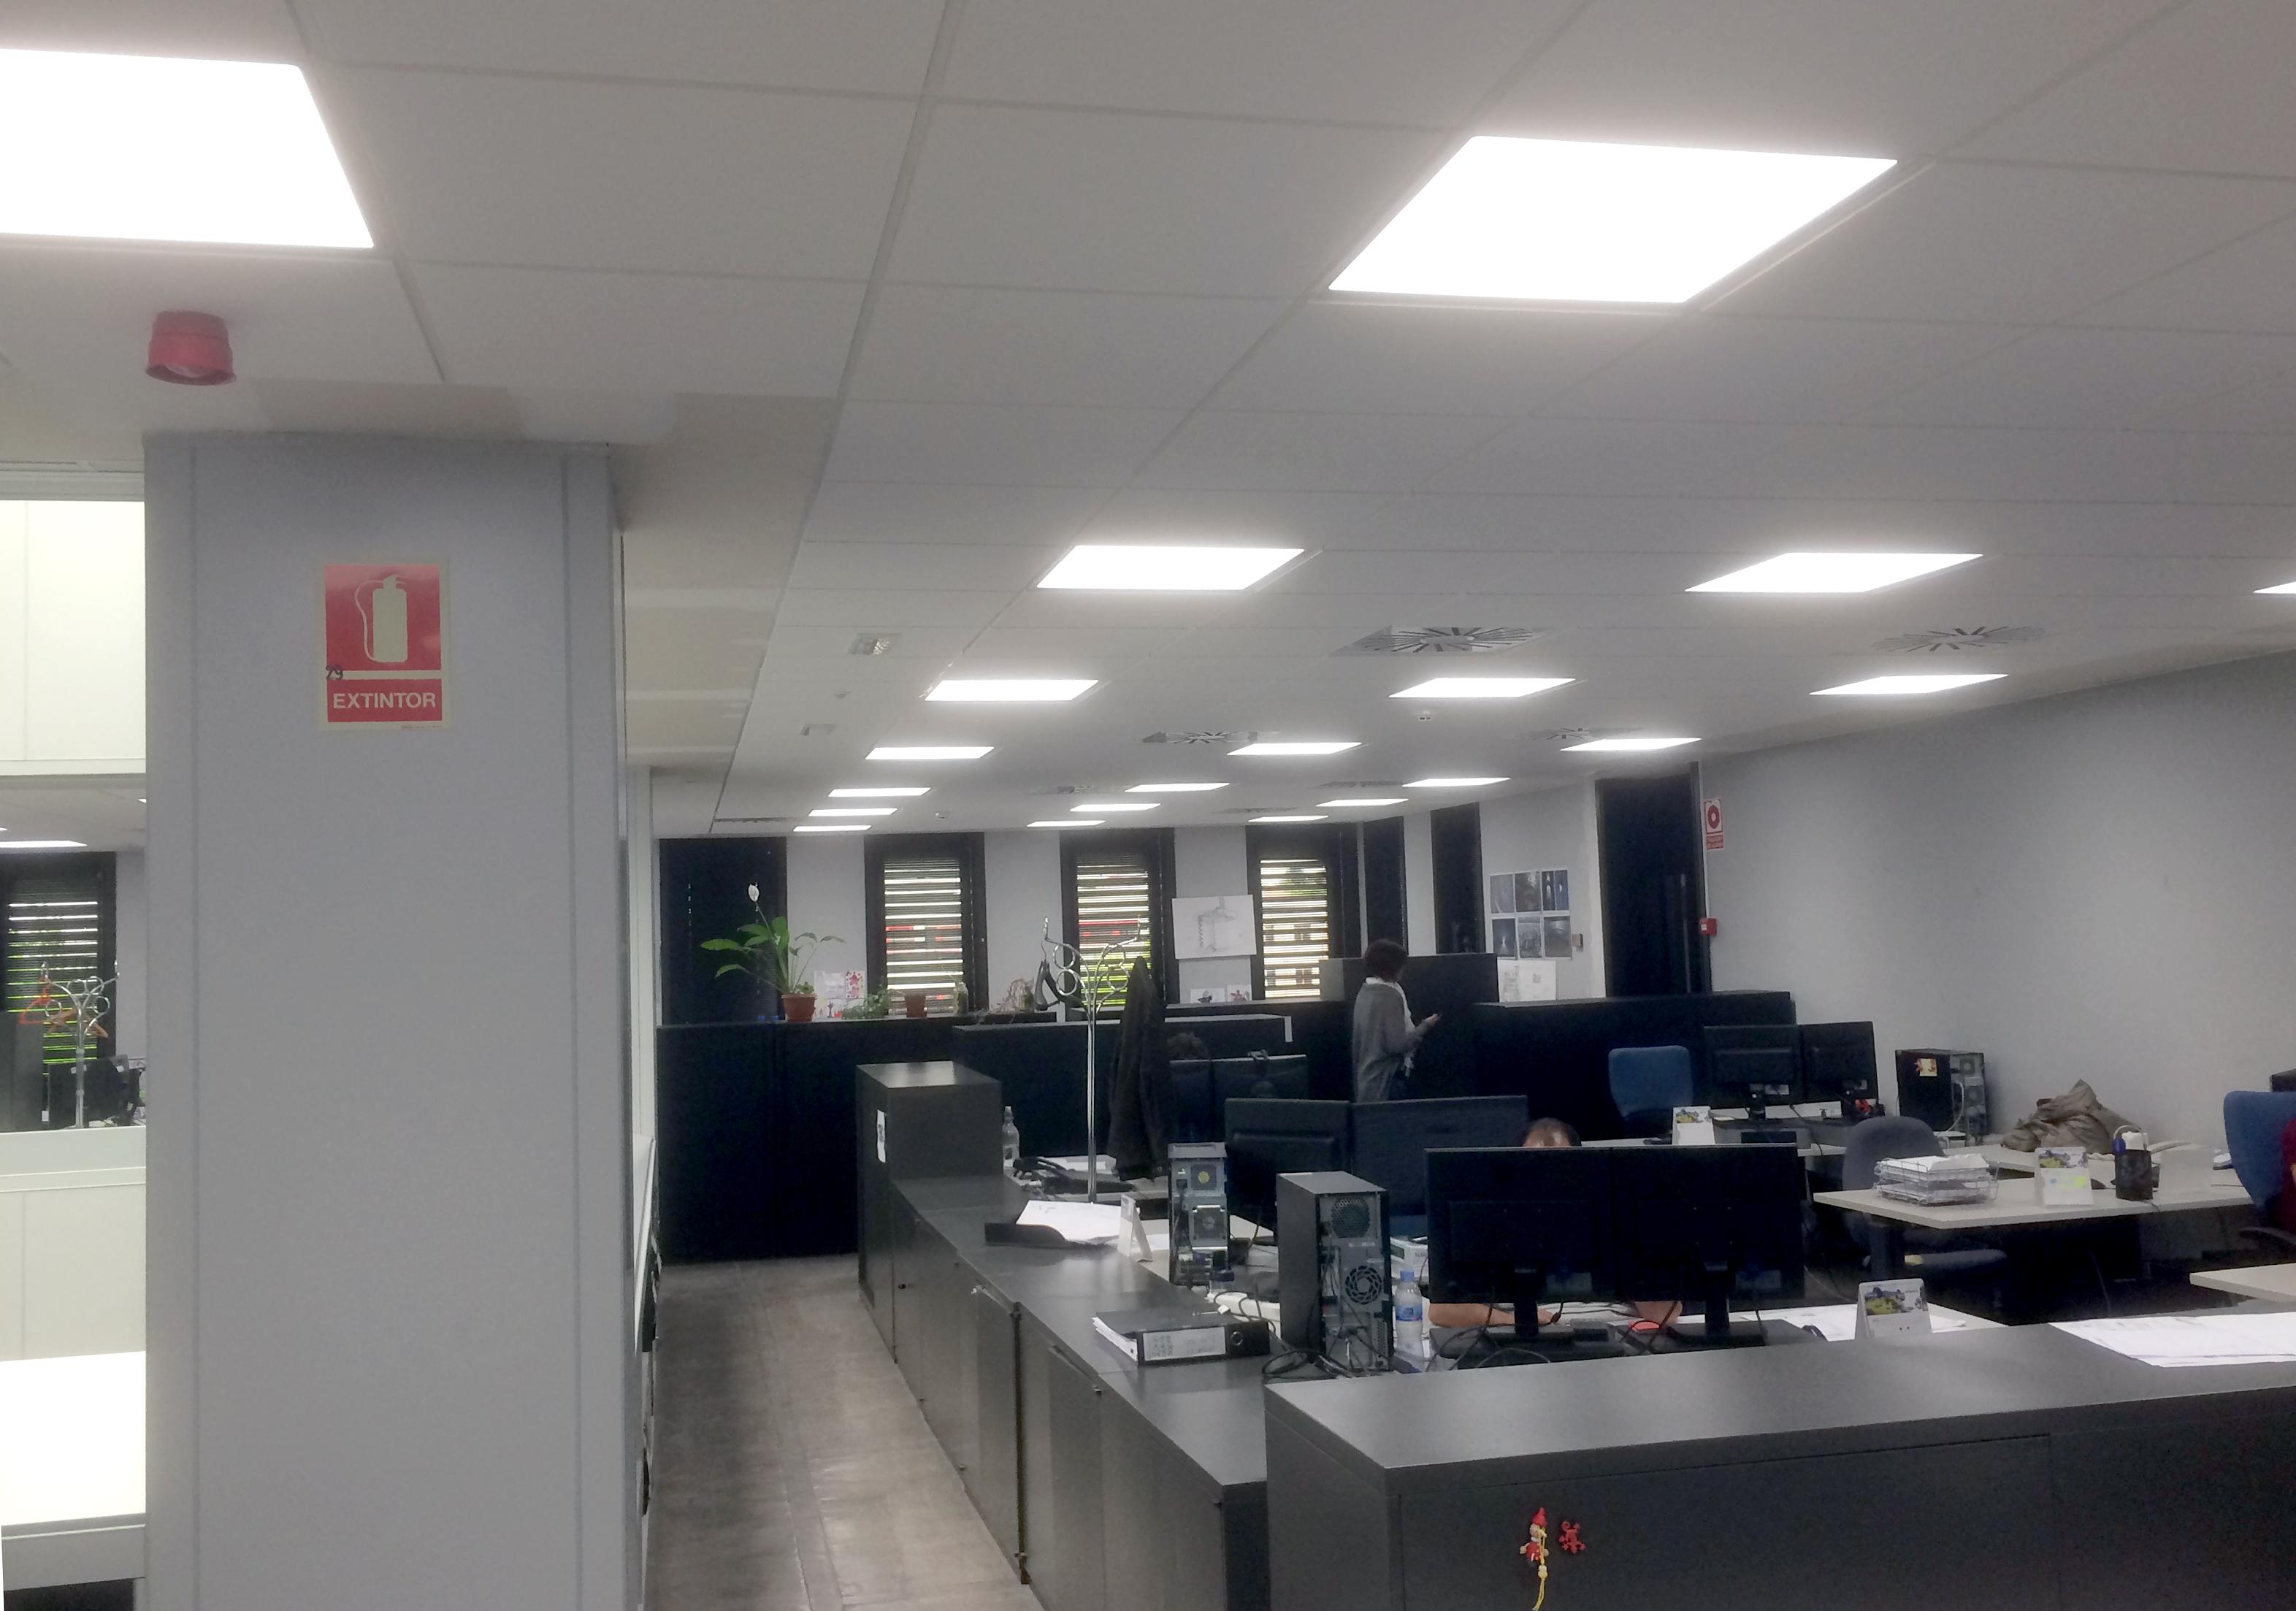 Sener oficinas teslaled for Oficina kutxabank tres cantos